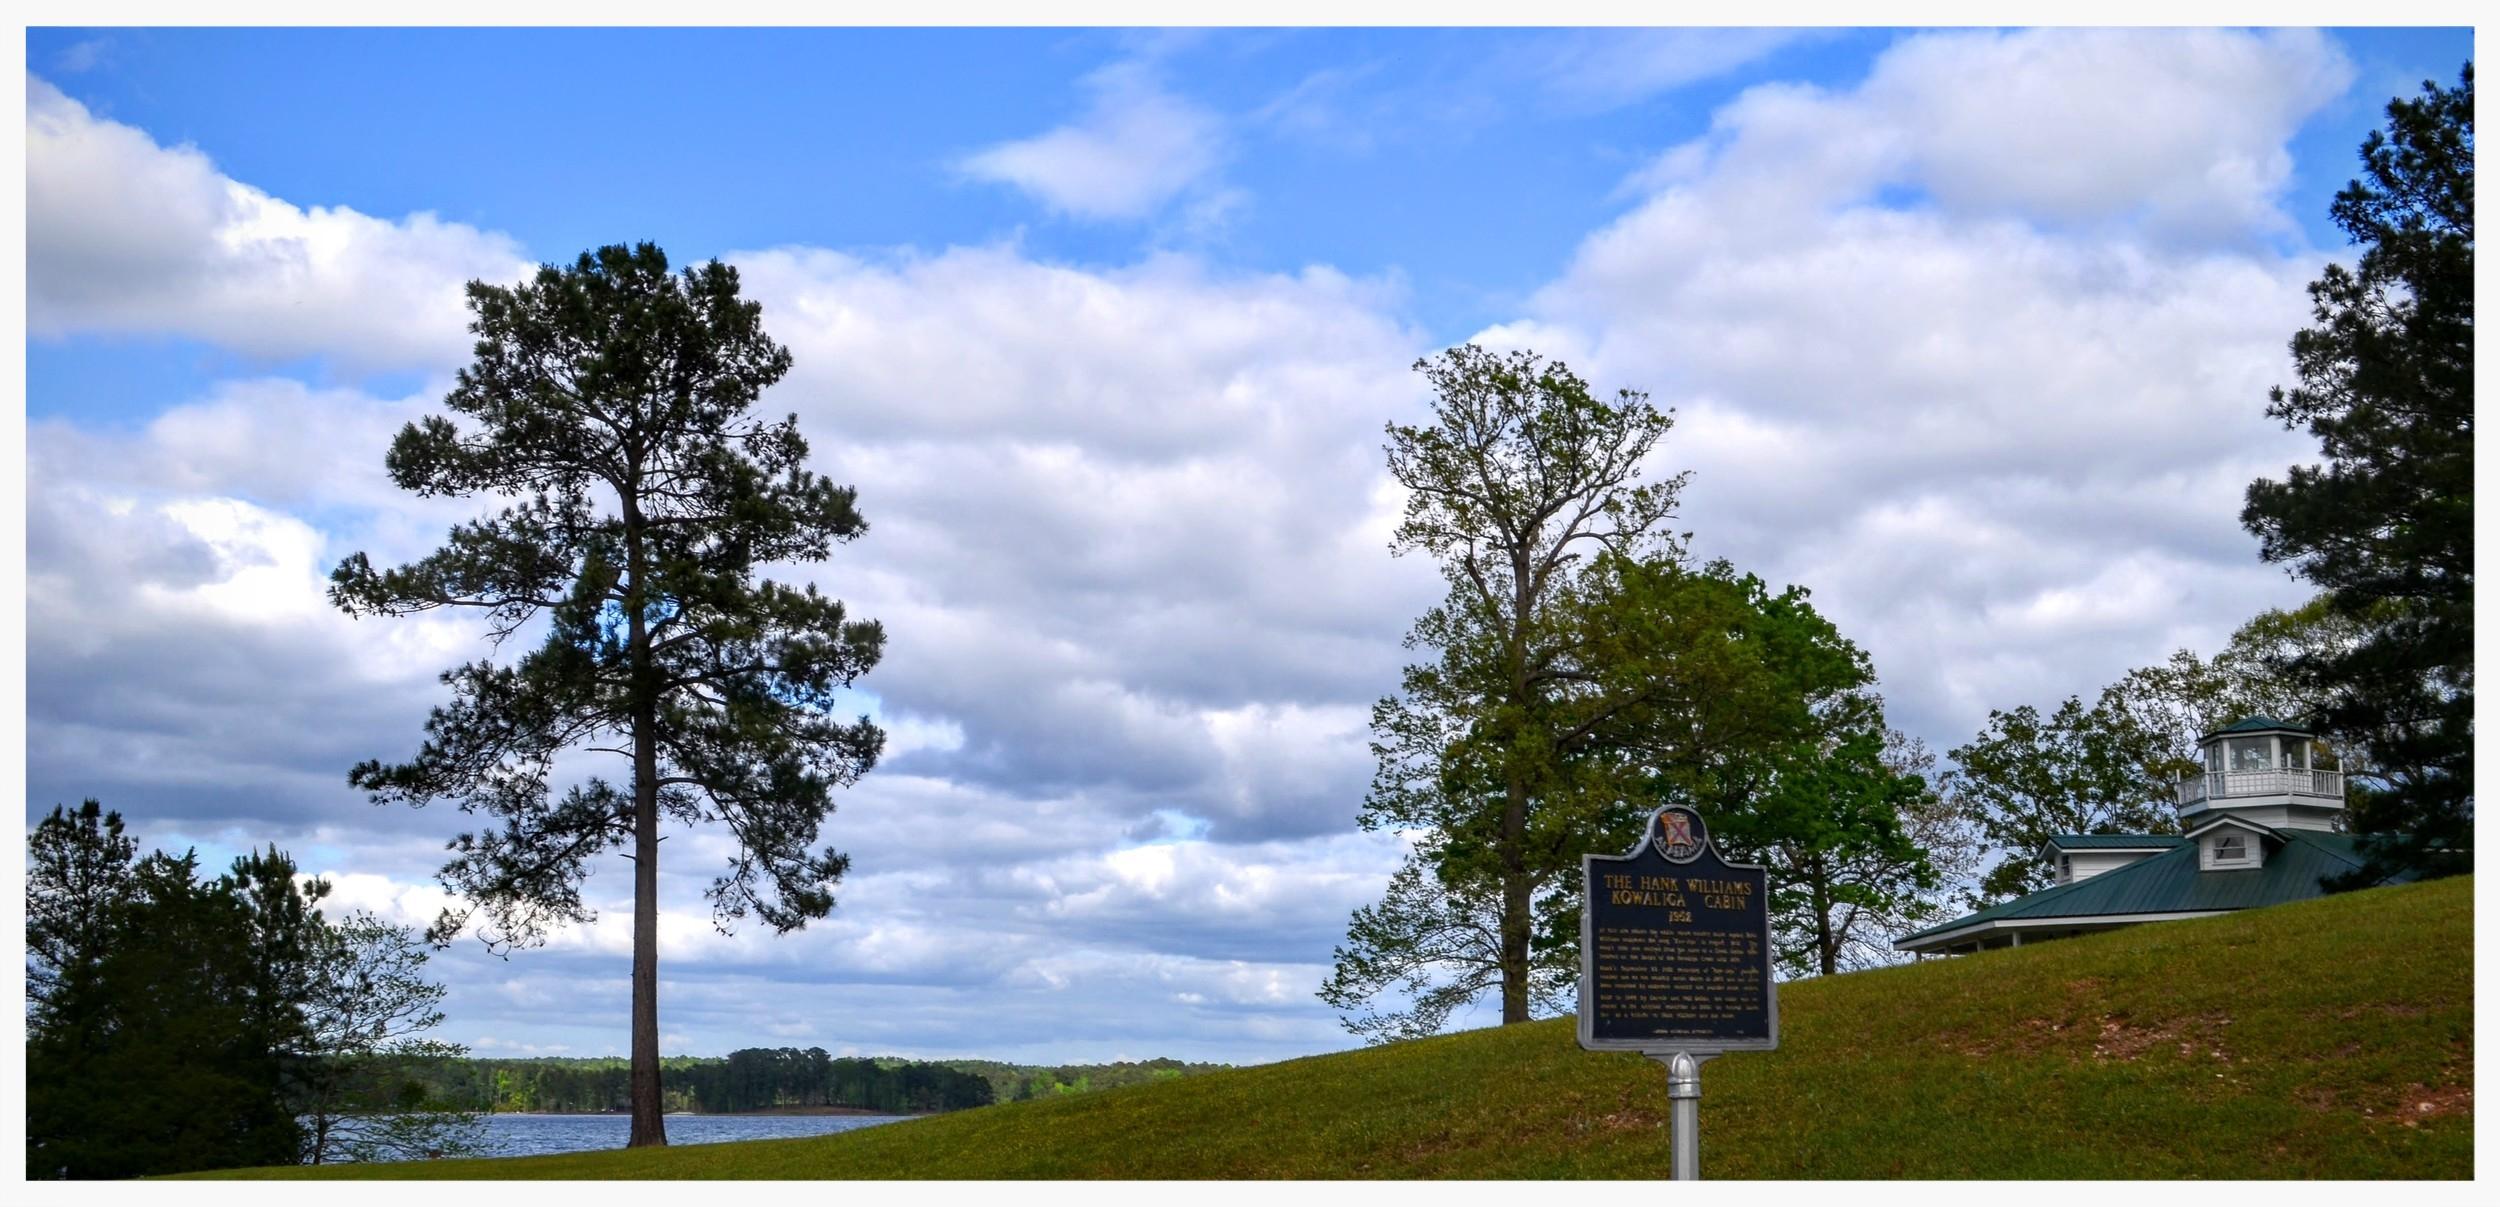 Kowaliga Cabin historical marker setting, Children's Harbor, Eclectic, Elmore County, Alabama